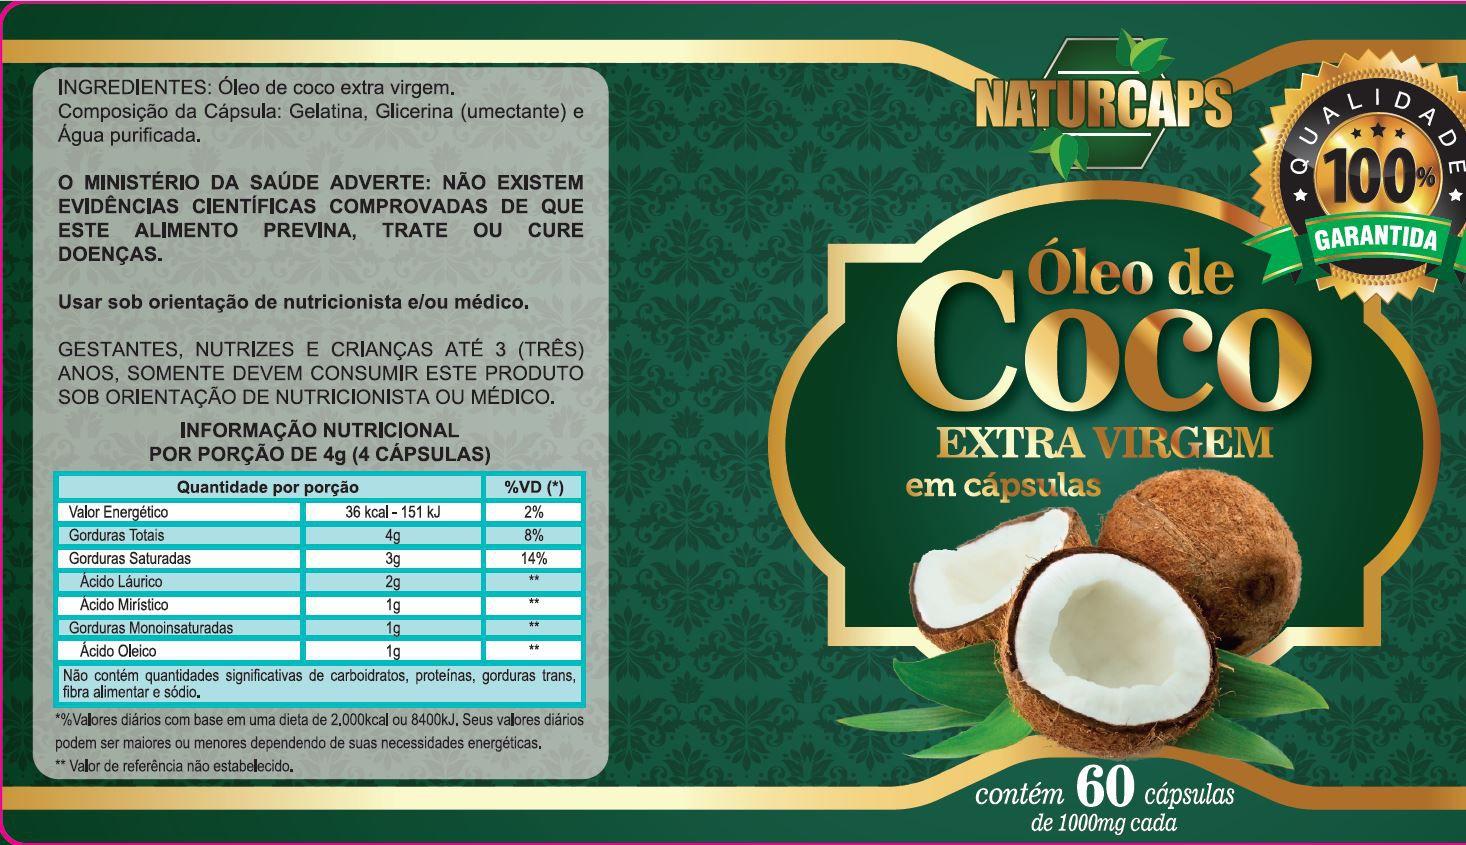 Kit 10x Oleo De Coco 1000mg Nutraceuticos Naturcaps Naturgen